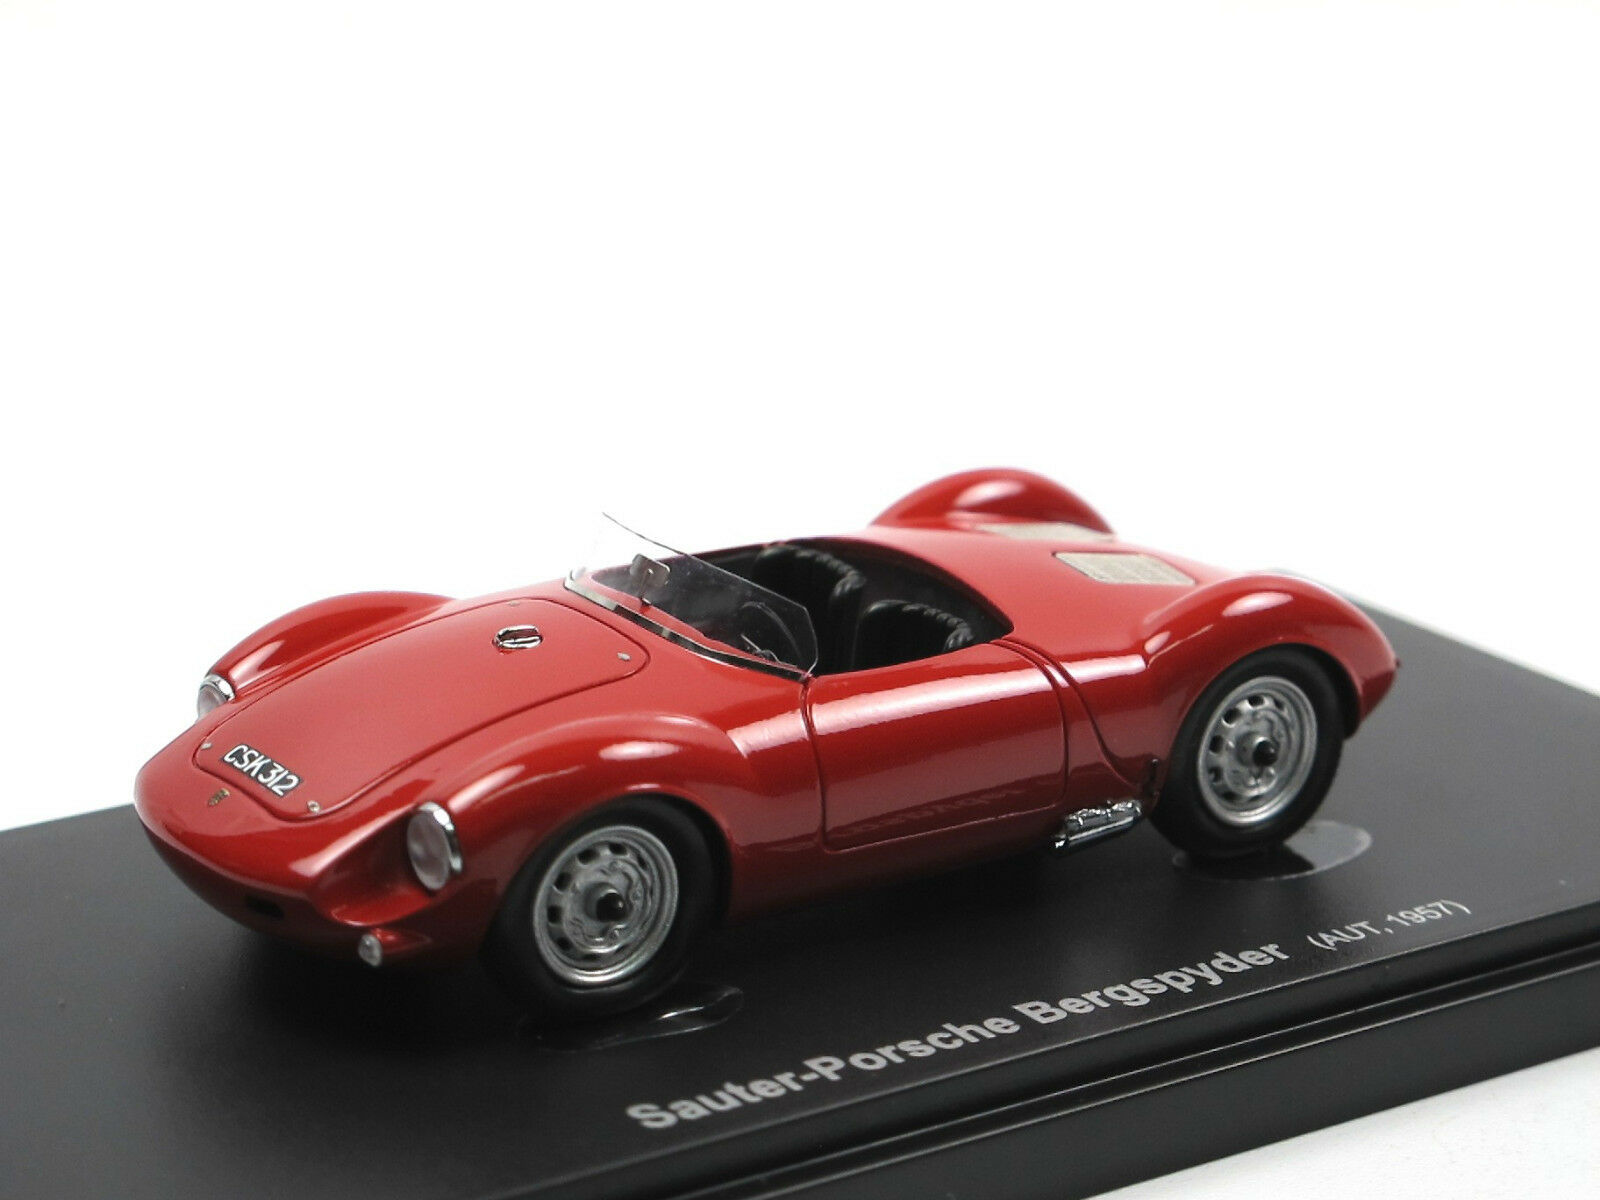 Avenue 43 1957 Sauter-Porsche bergspyder rojo resine 1 43 autocult Models